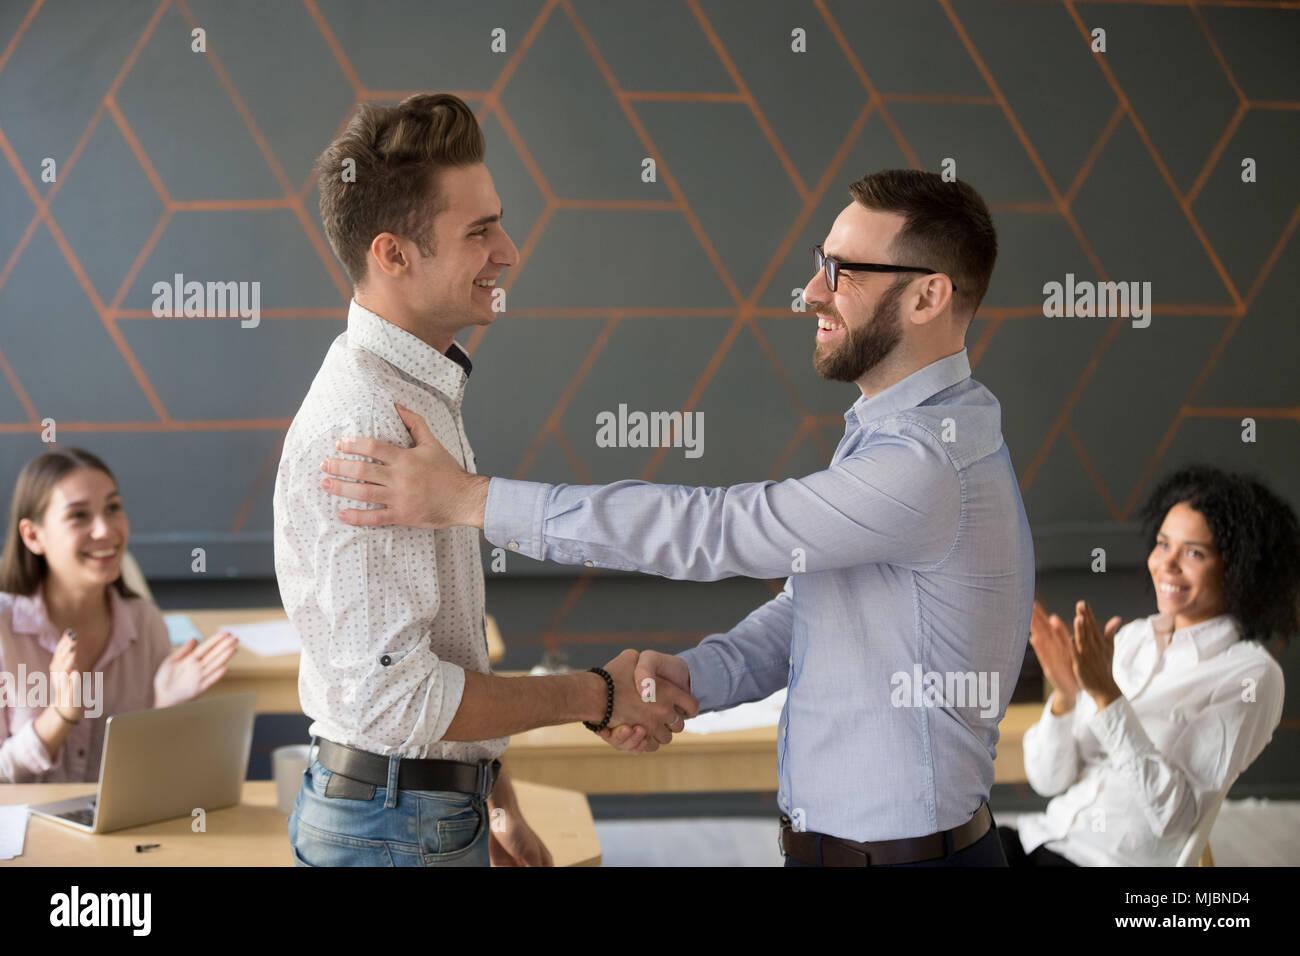 Team leader handshaking employee congratulating with professiona - Stock Image